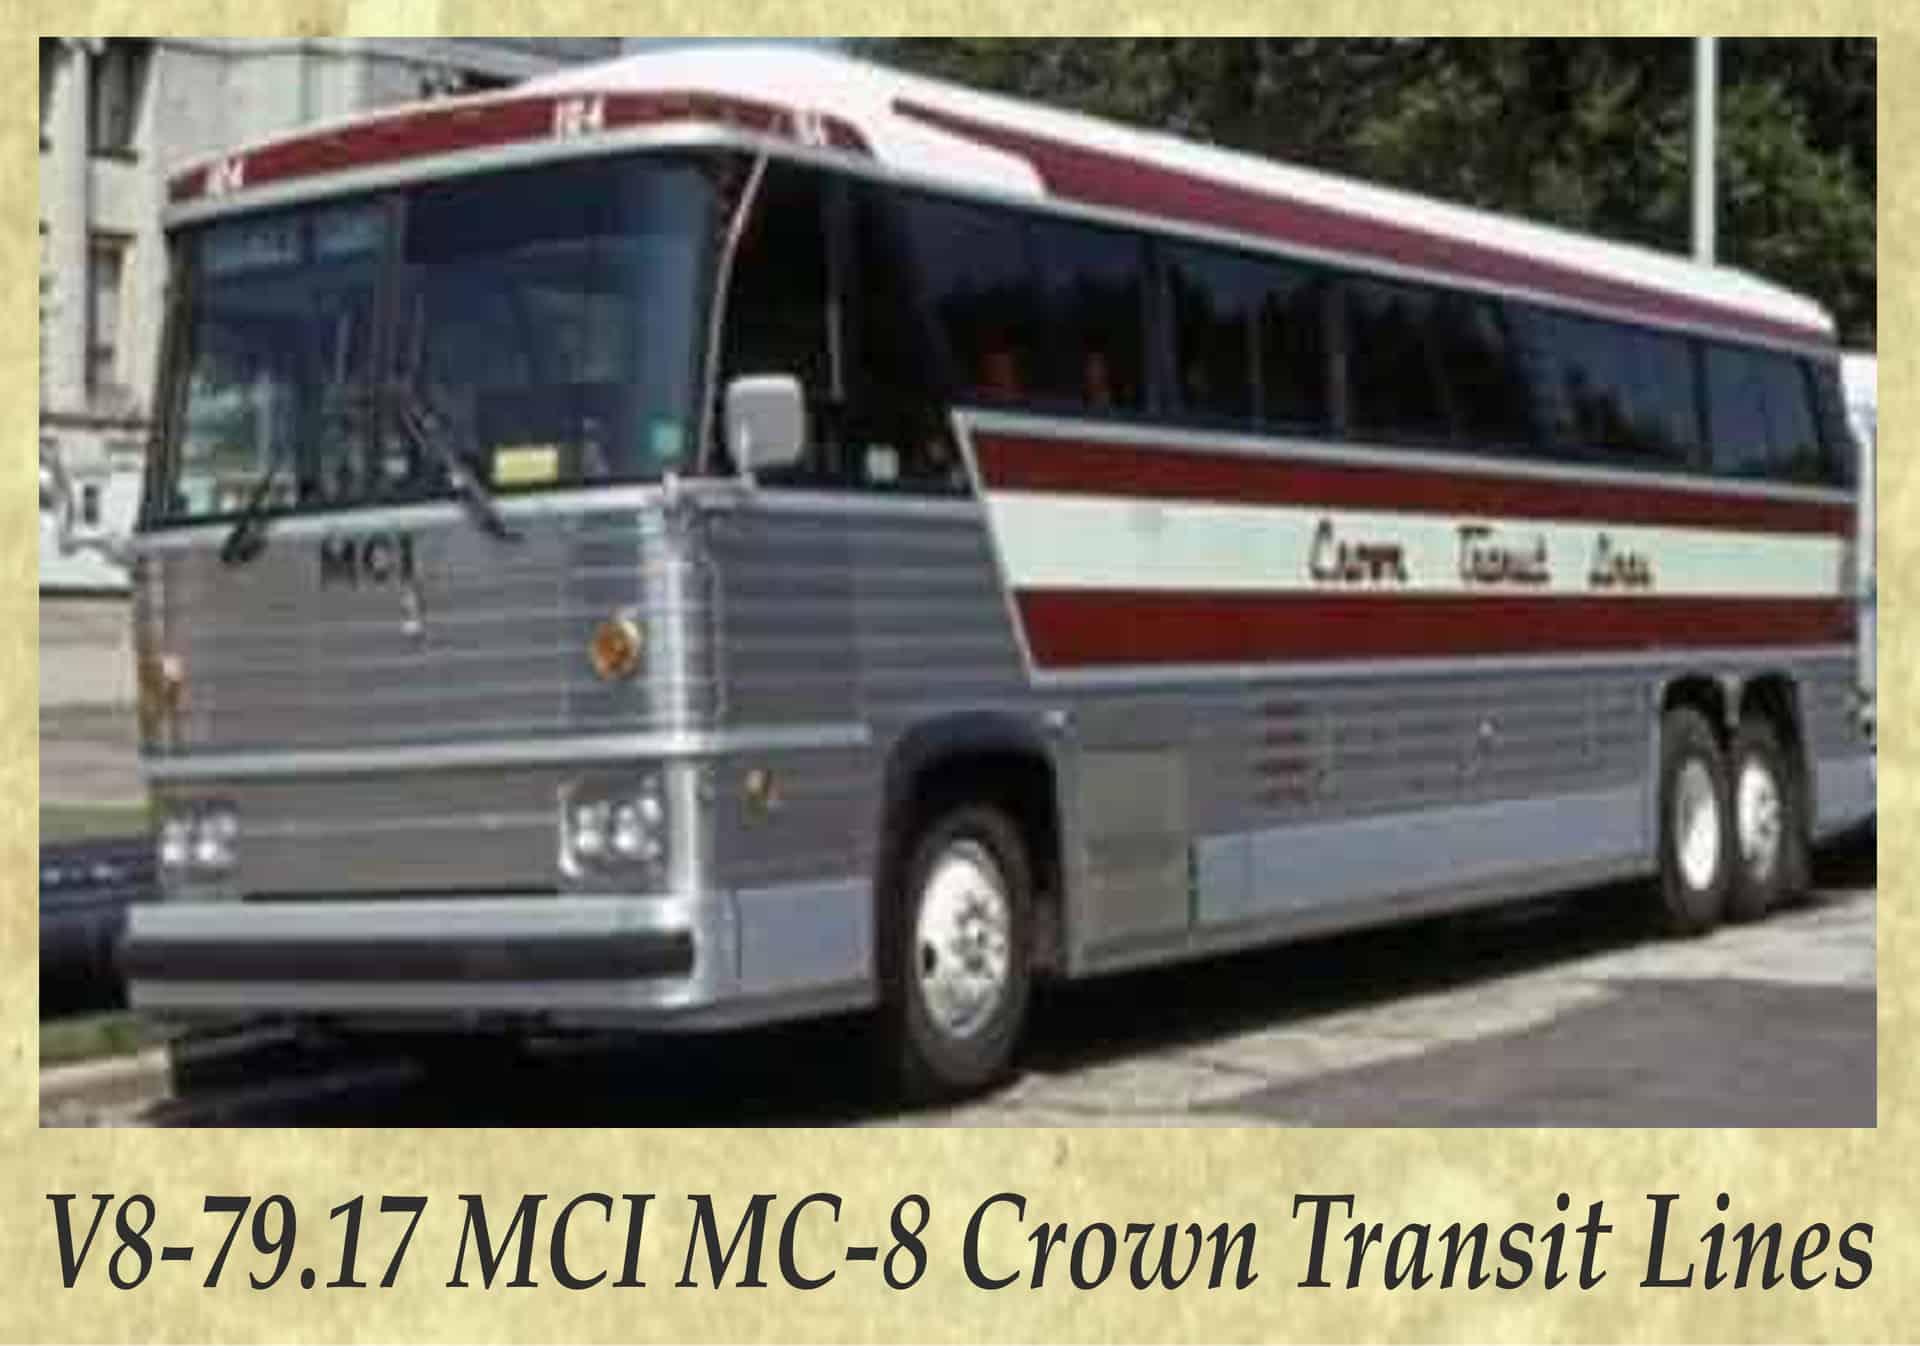 V8-79.17 MCI MC-8 Crown Transit Lines